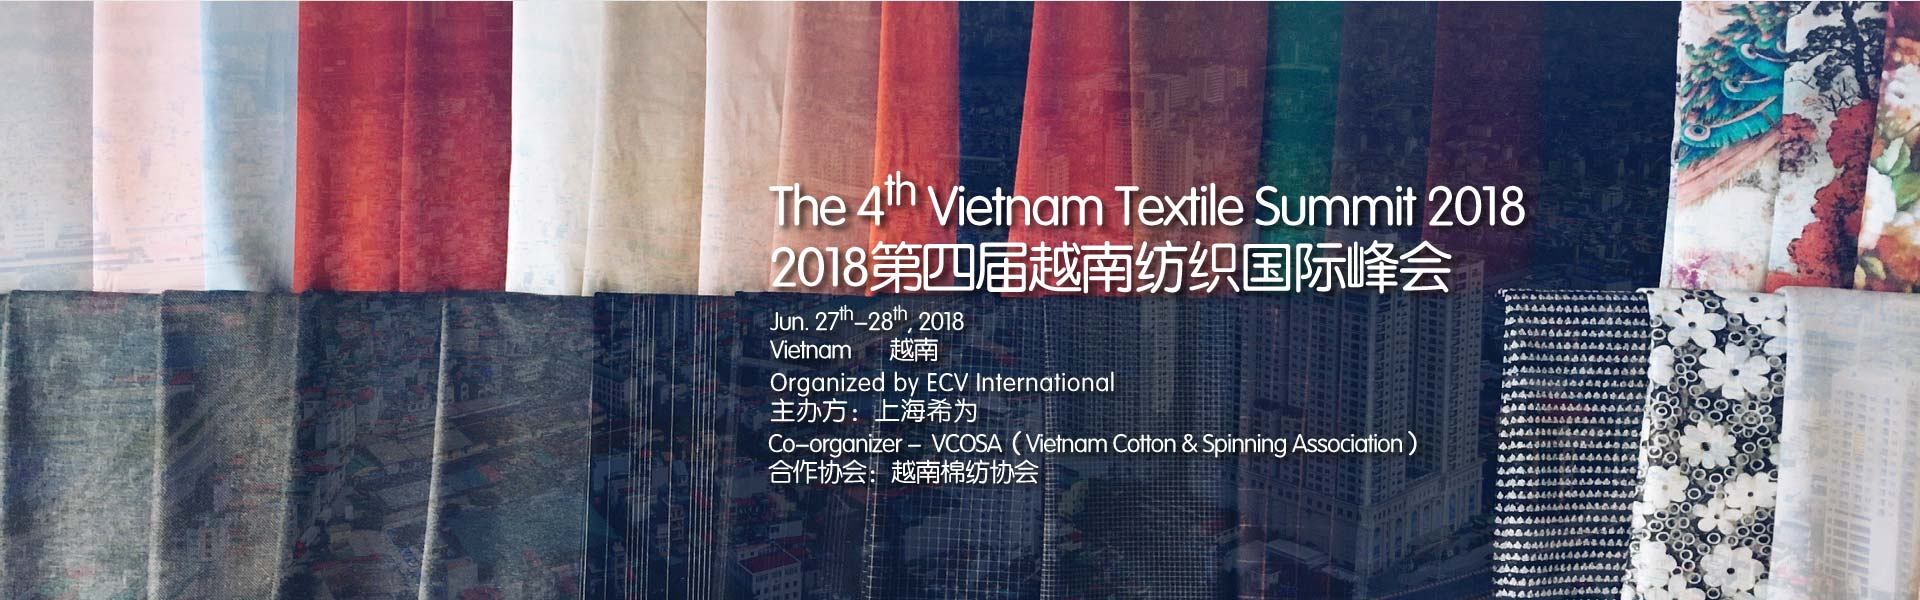 The 4th Vietnam Textile Summit 2018